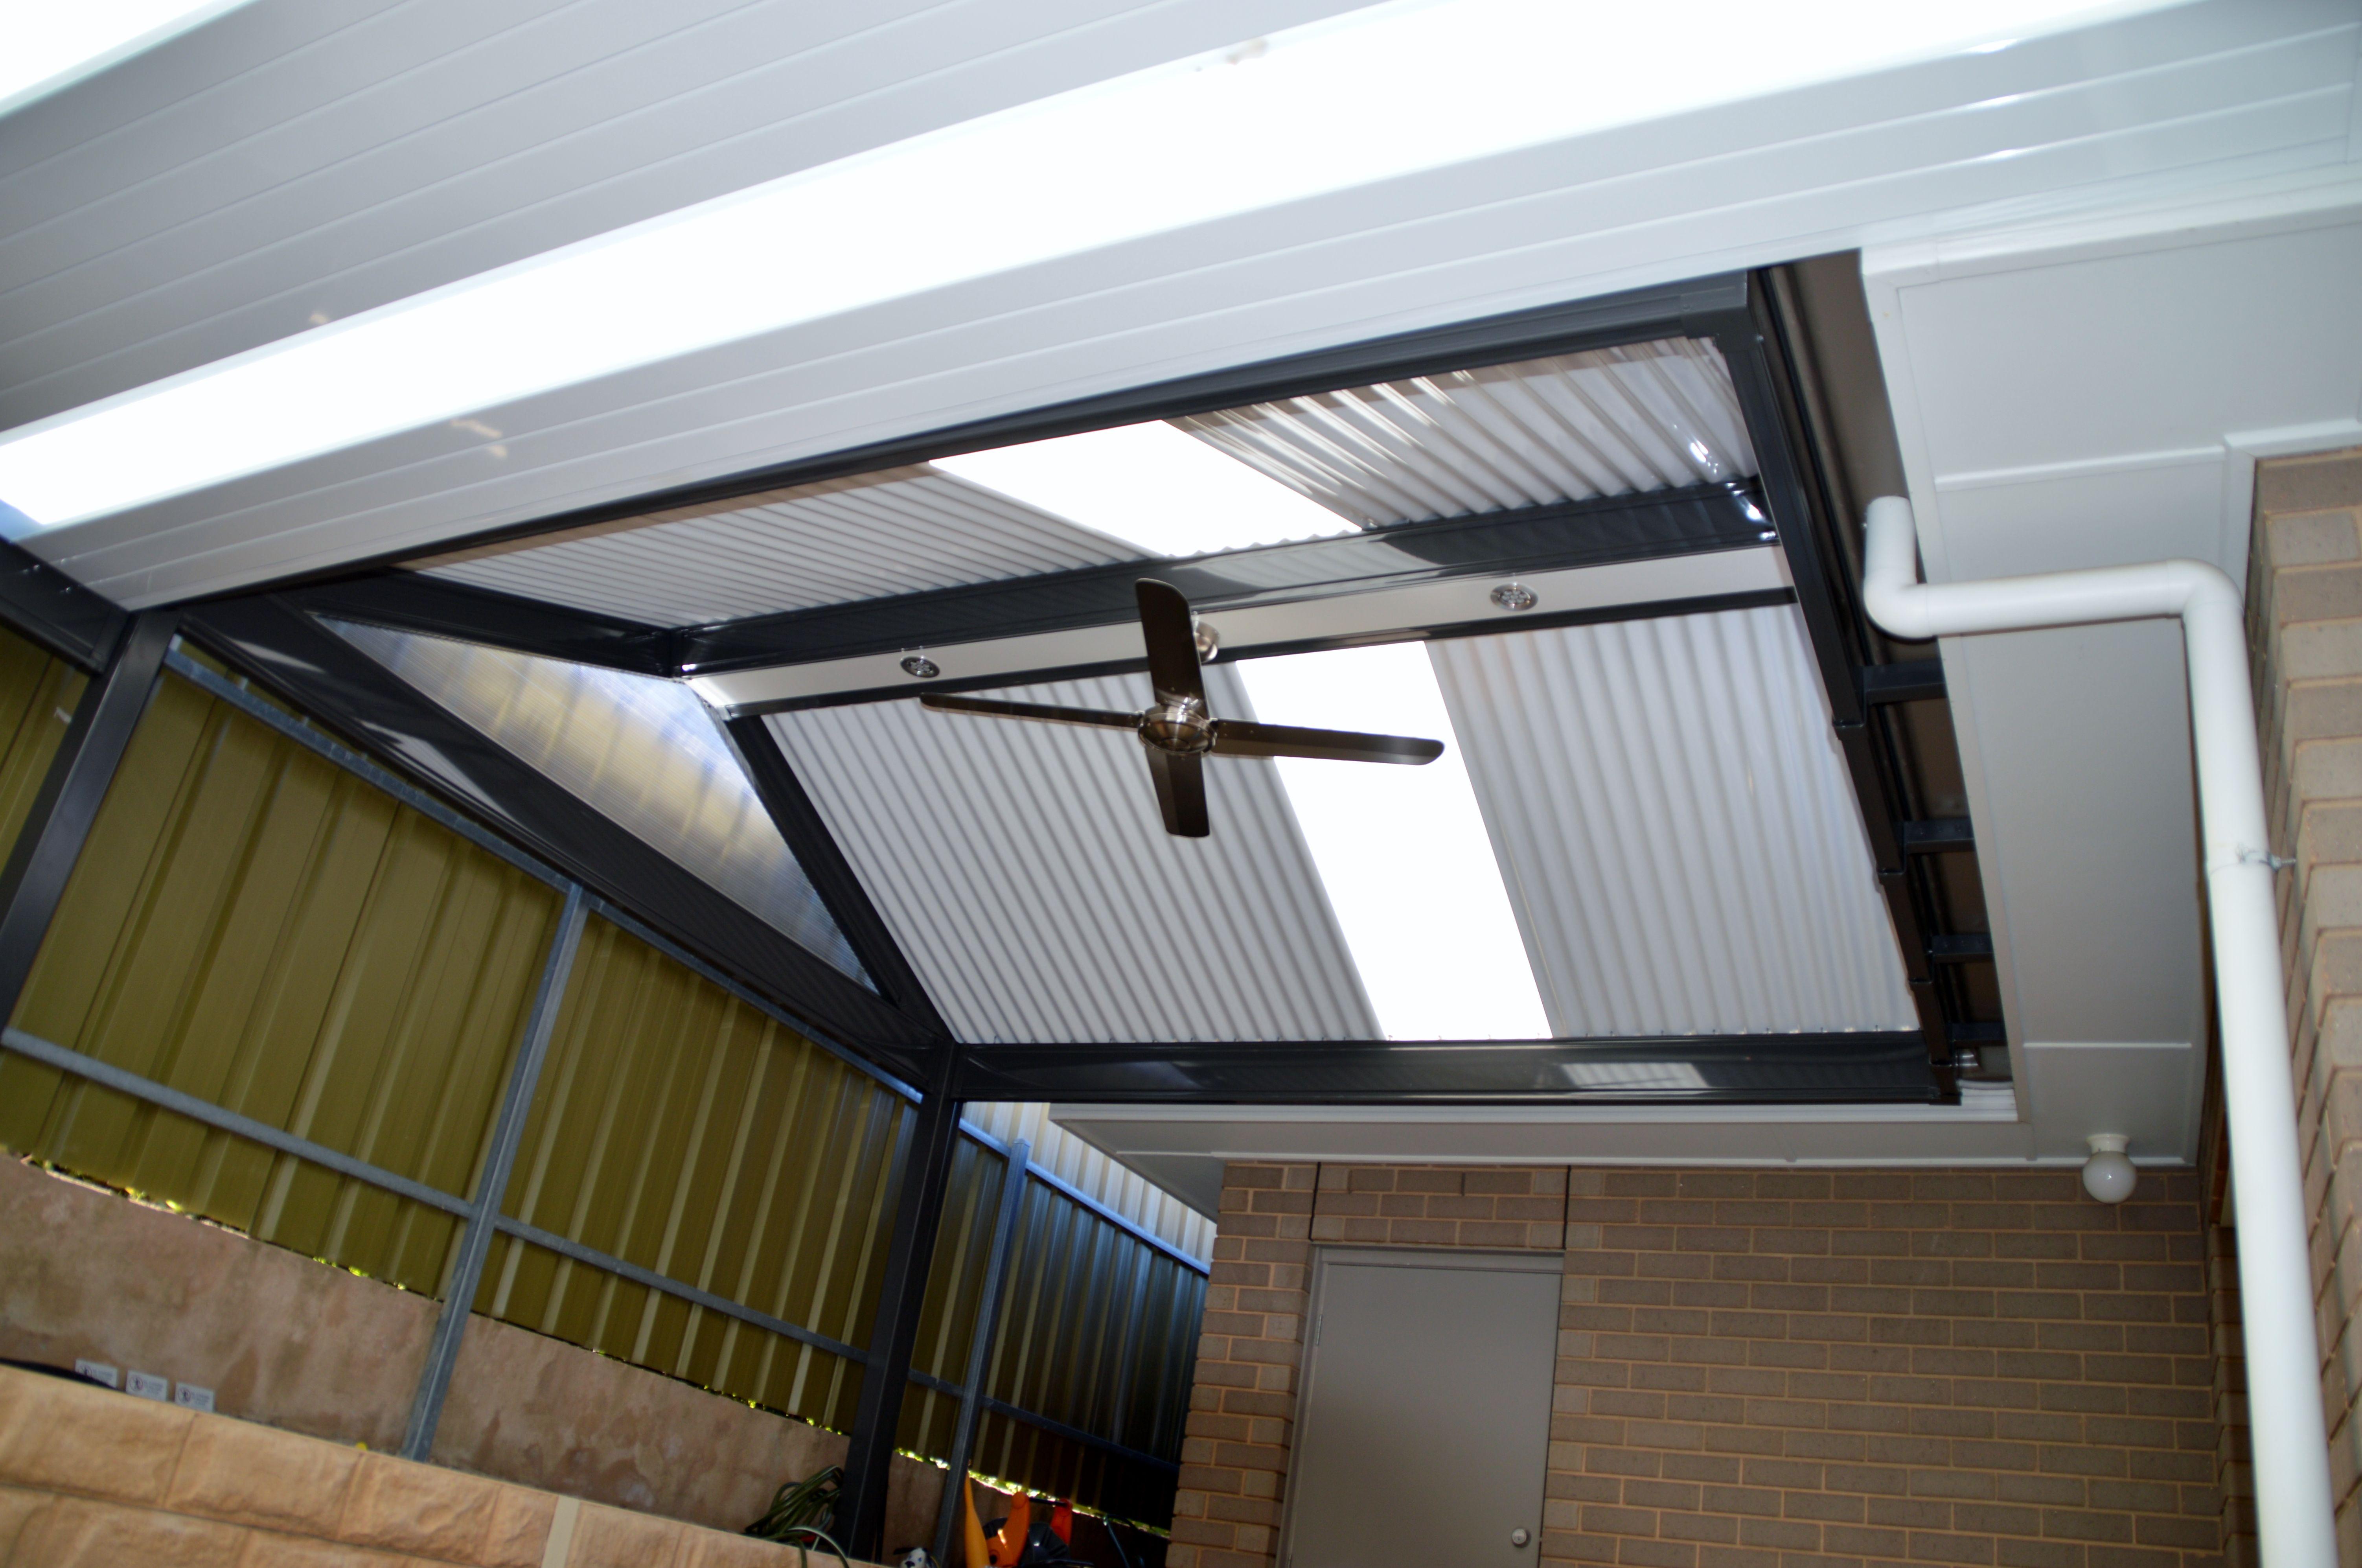 verandah lighting. DMV Pergola, Verandah And Patio Lighting Fans Designs